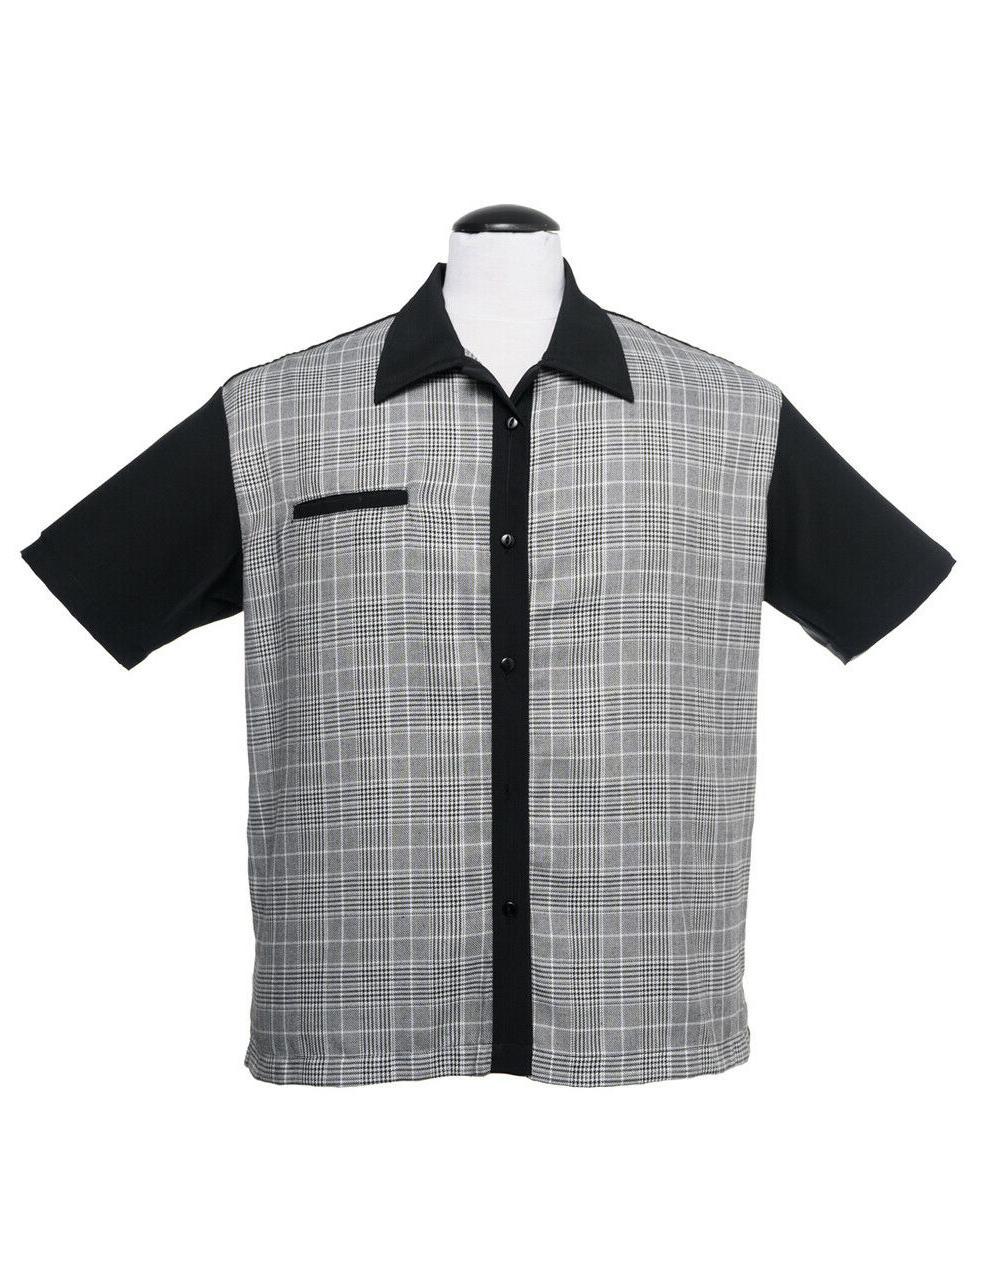 Steady Clothing Bad News Felix Retro Bowling Black Button Do